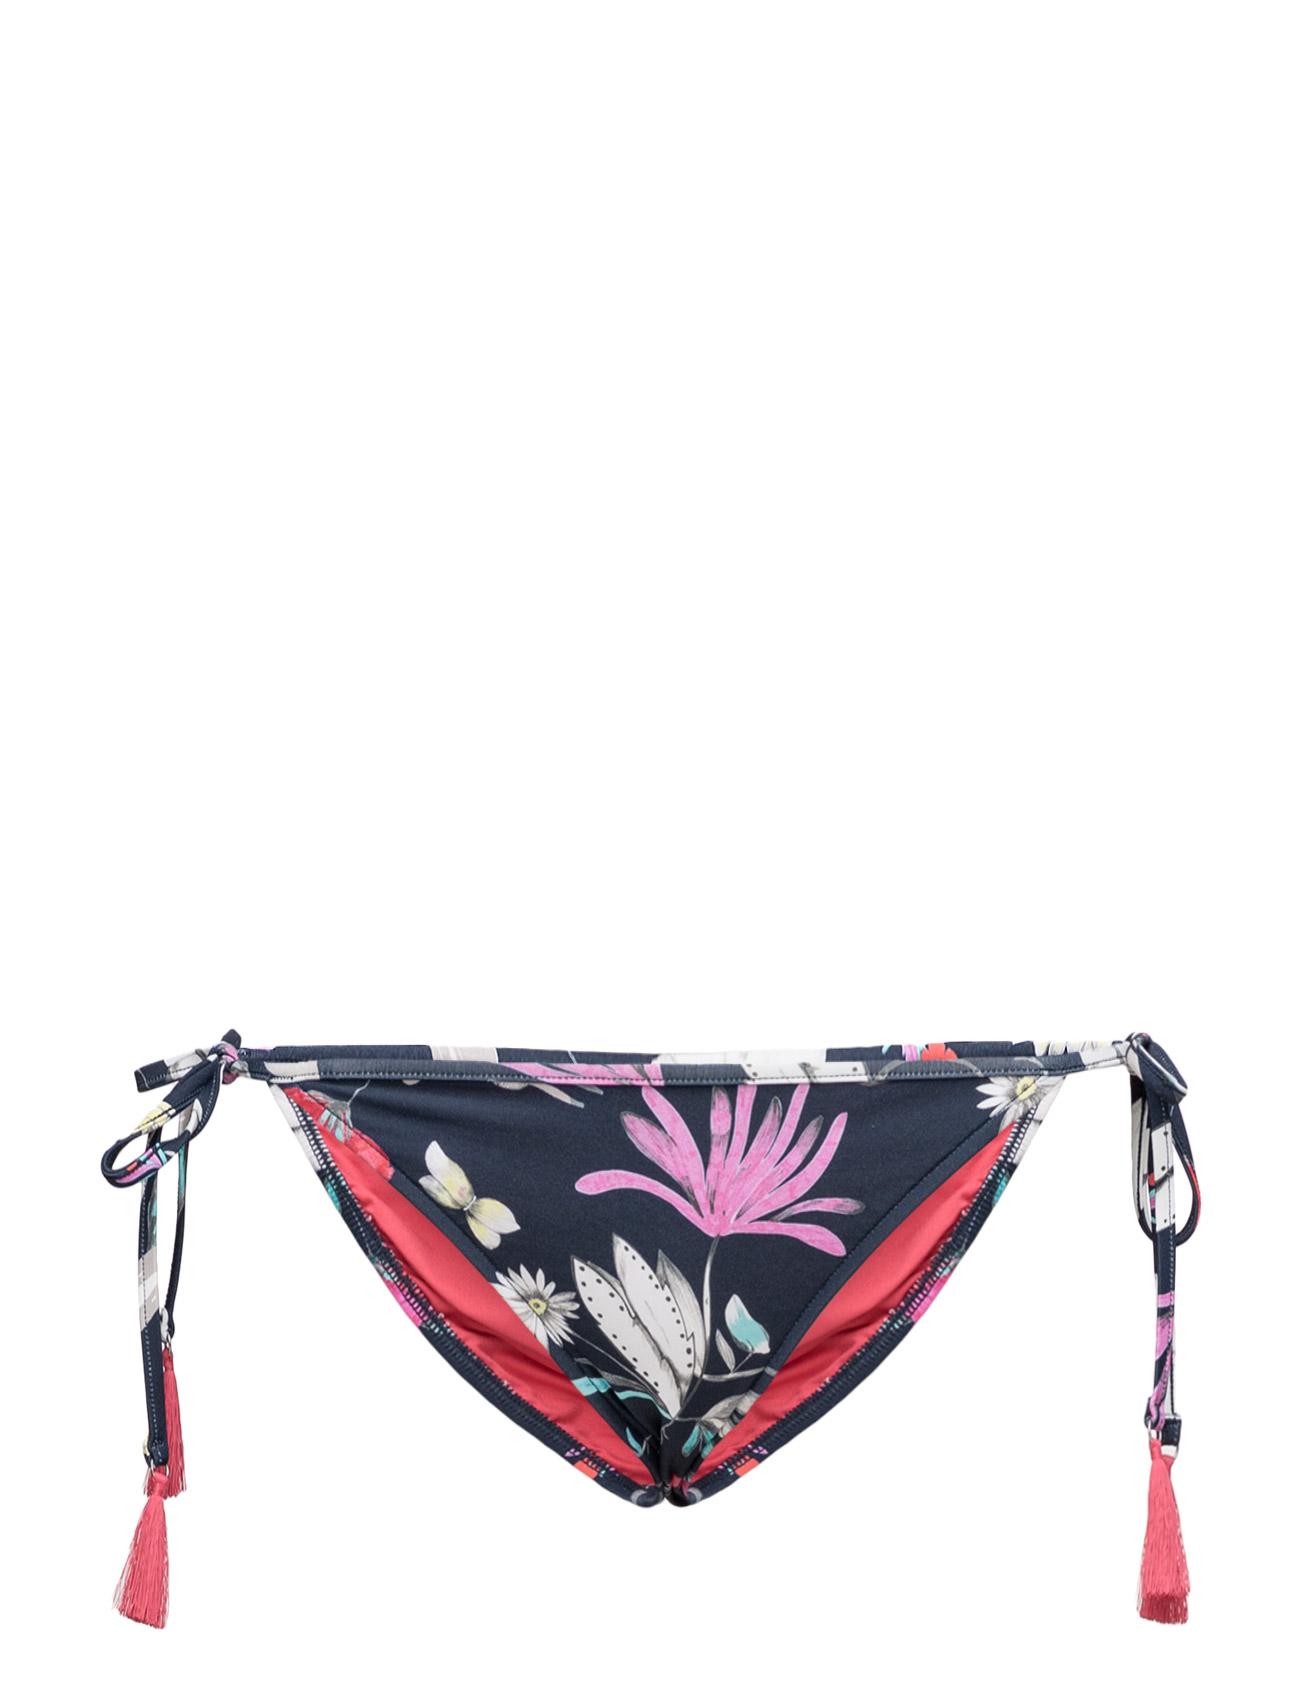 Flowerfestival Hipster Tieside Seafolly Bikinier til Damer i indigo